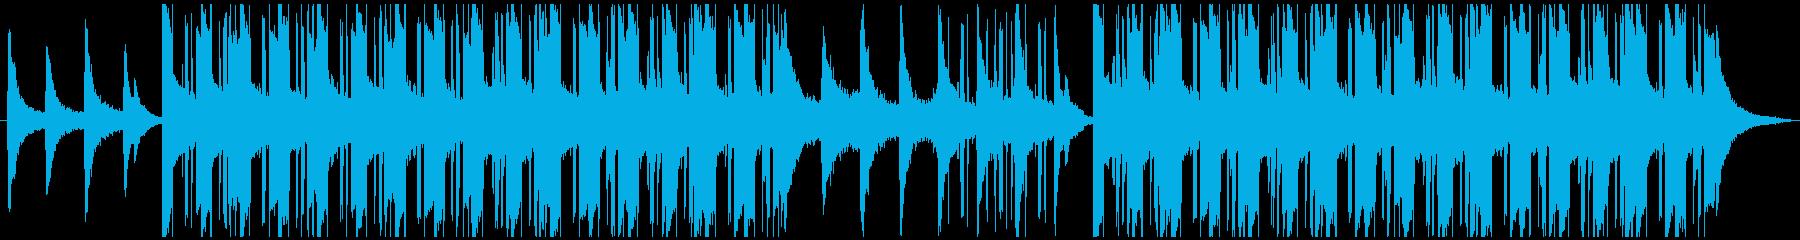 Urban hip hop music's reproduced waveform